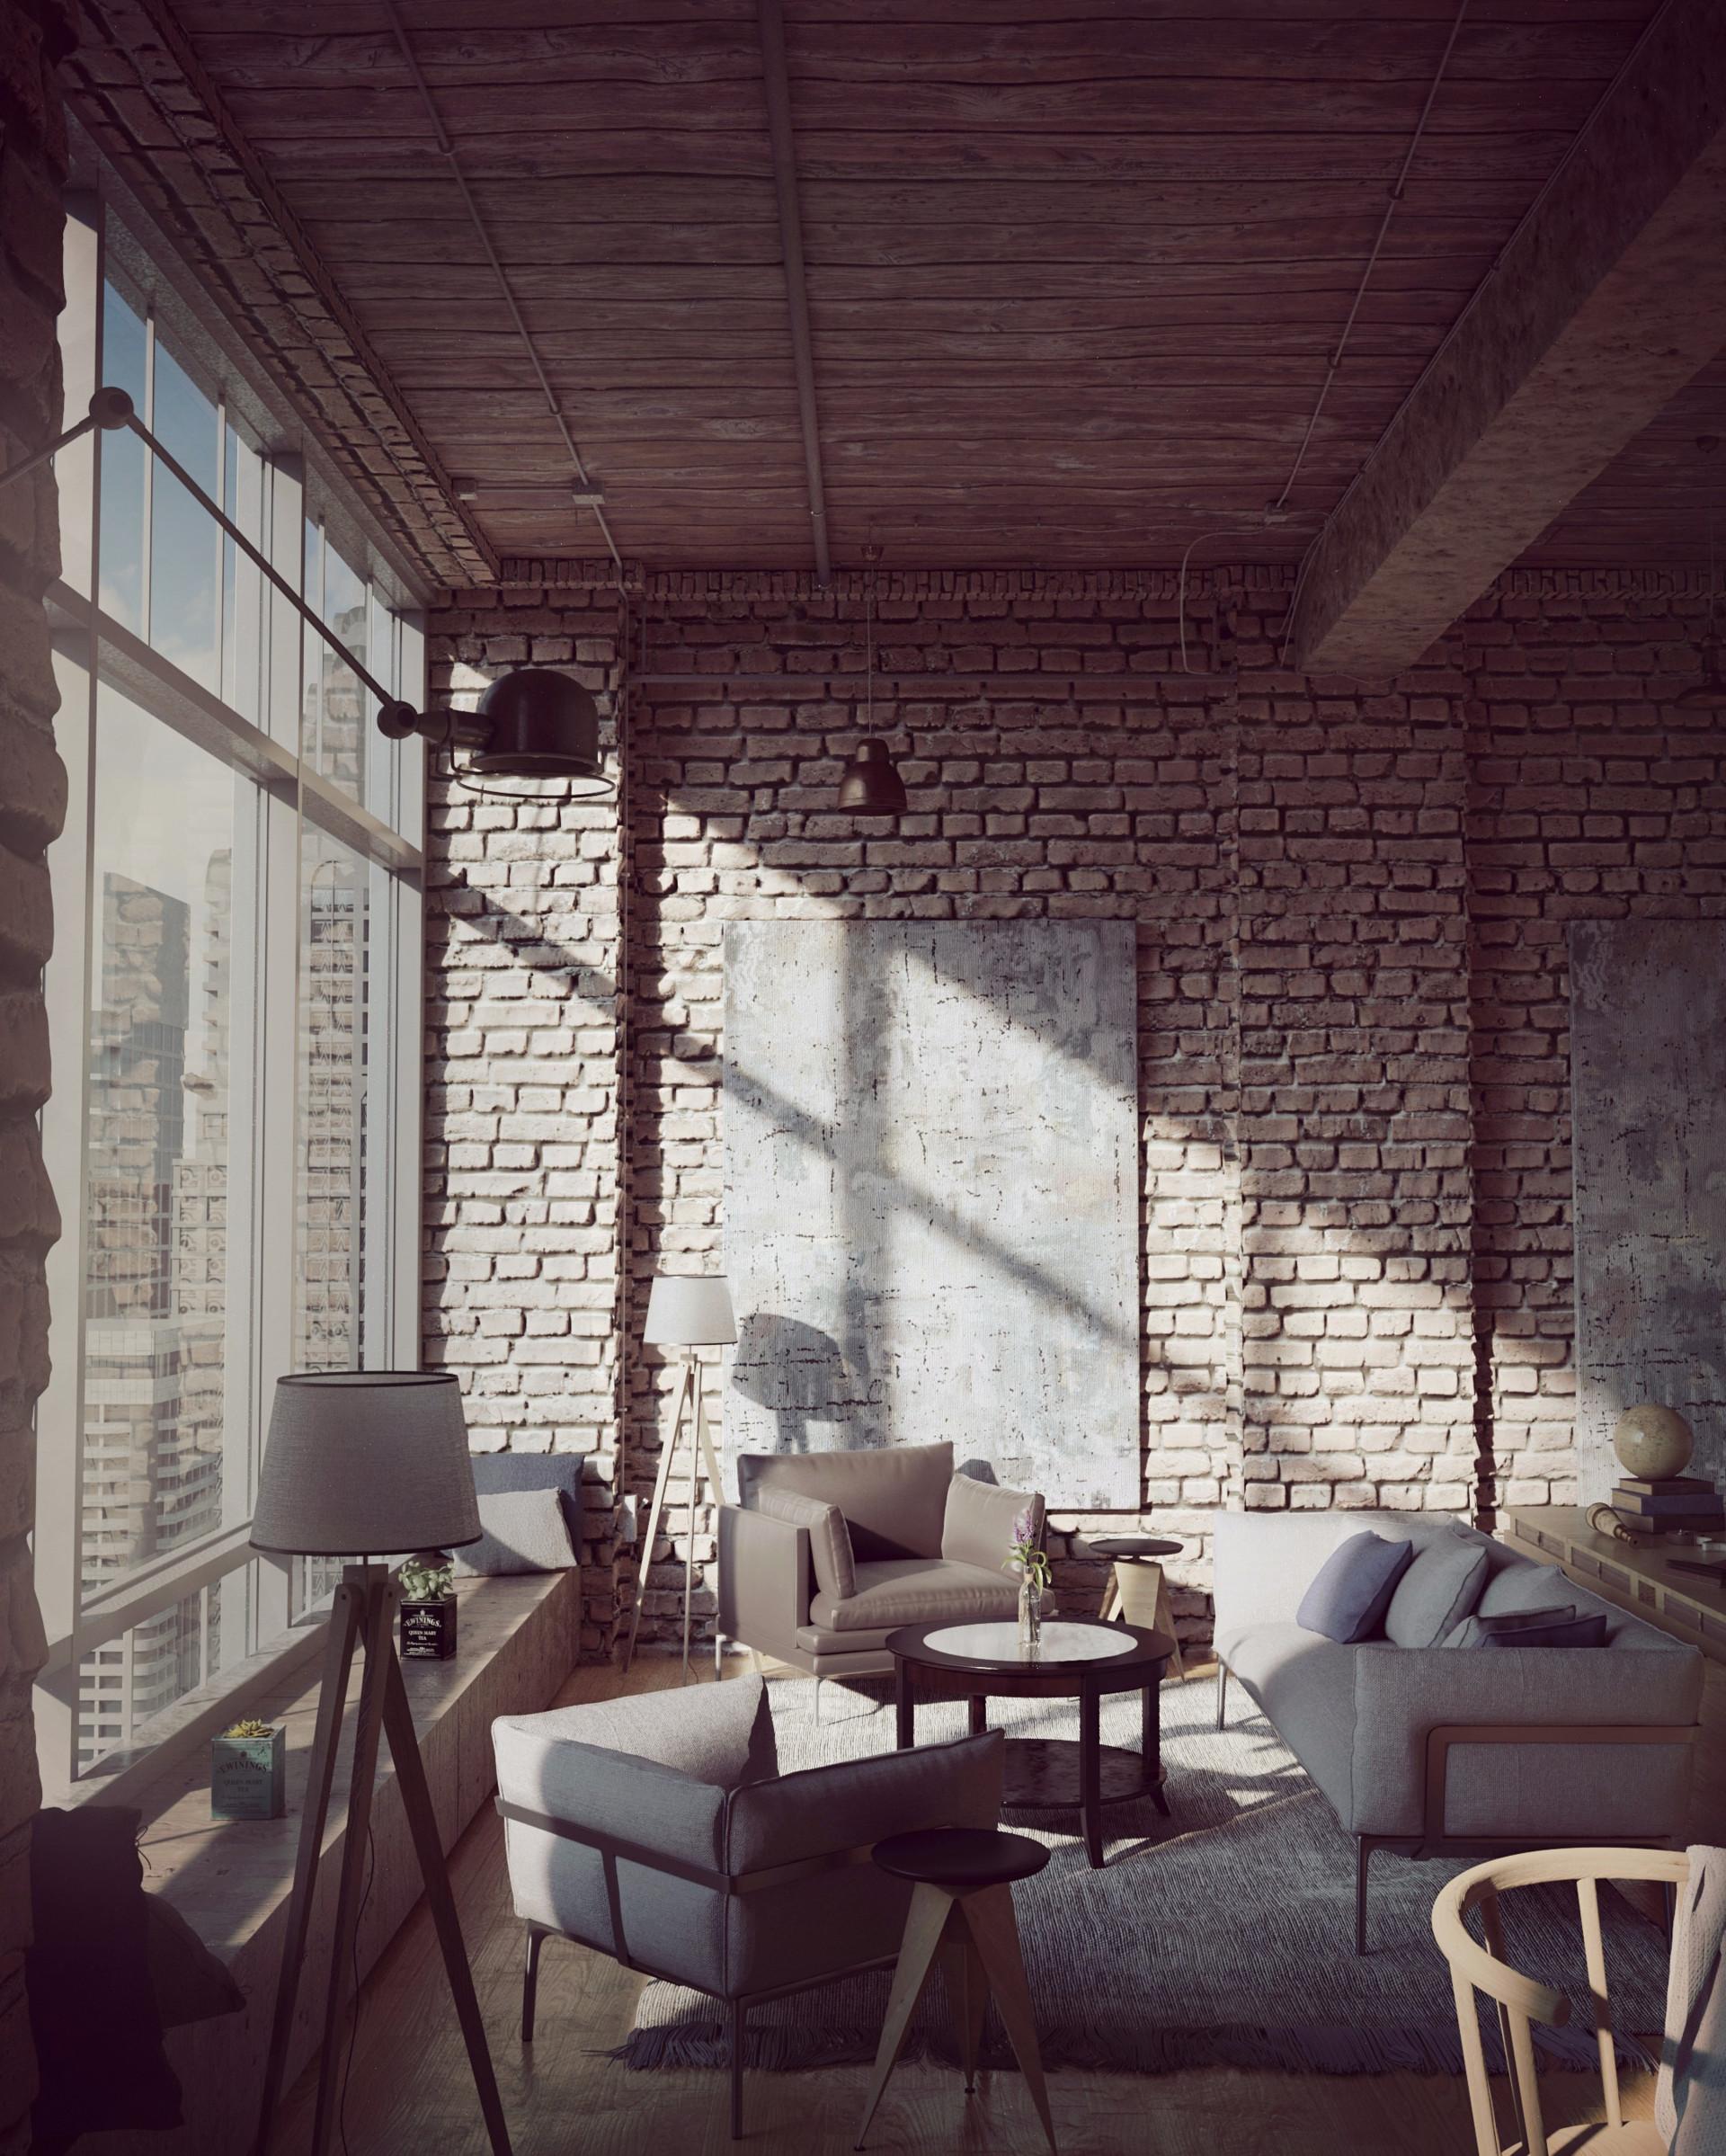 Steam loft filmic render blendernation for Cinema 4d architecture